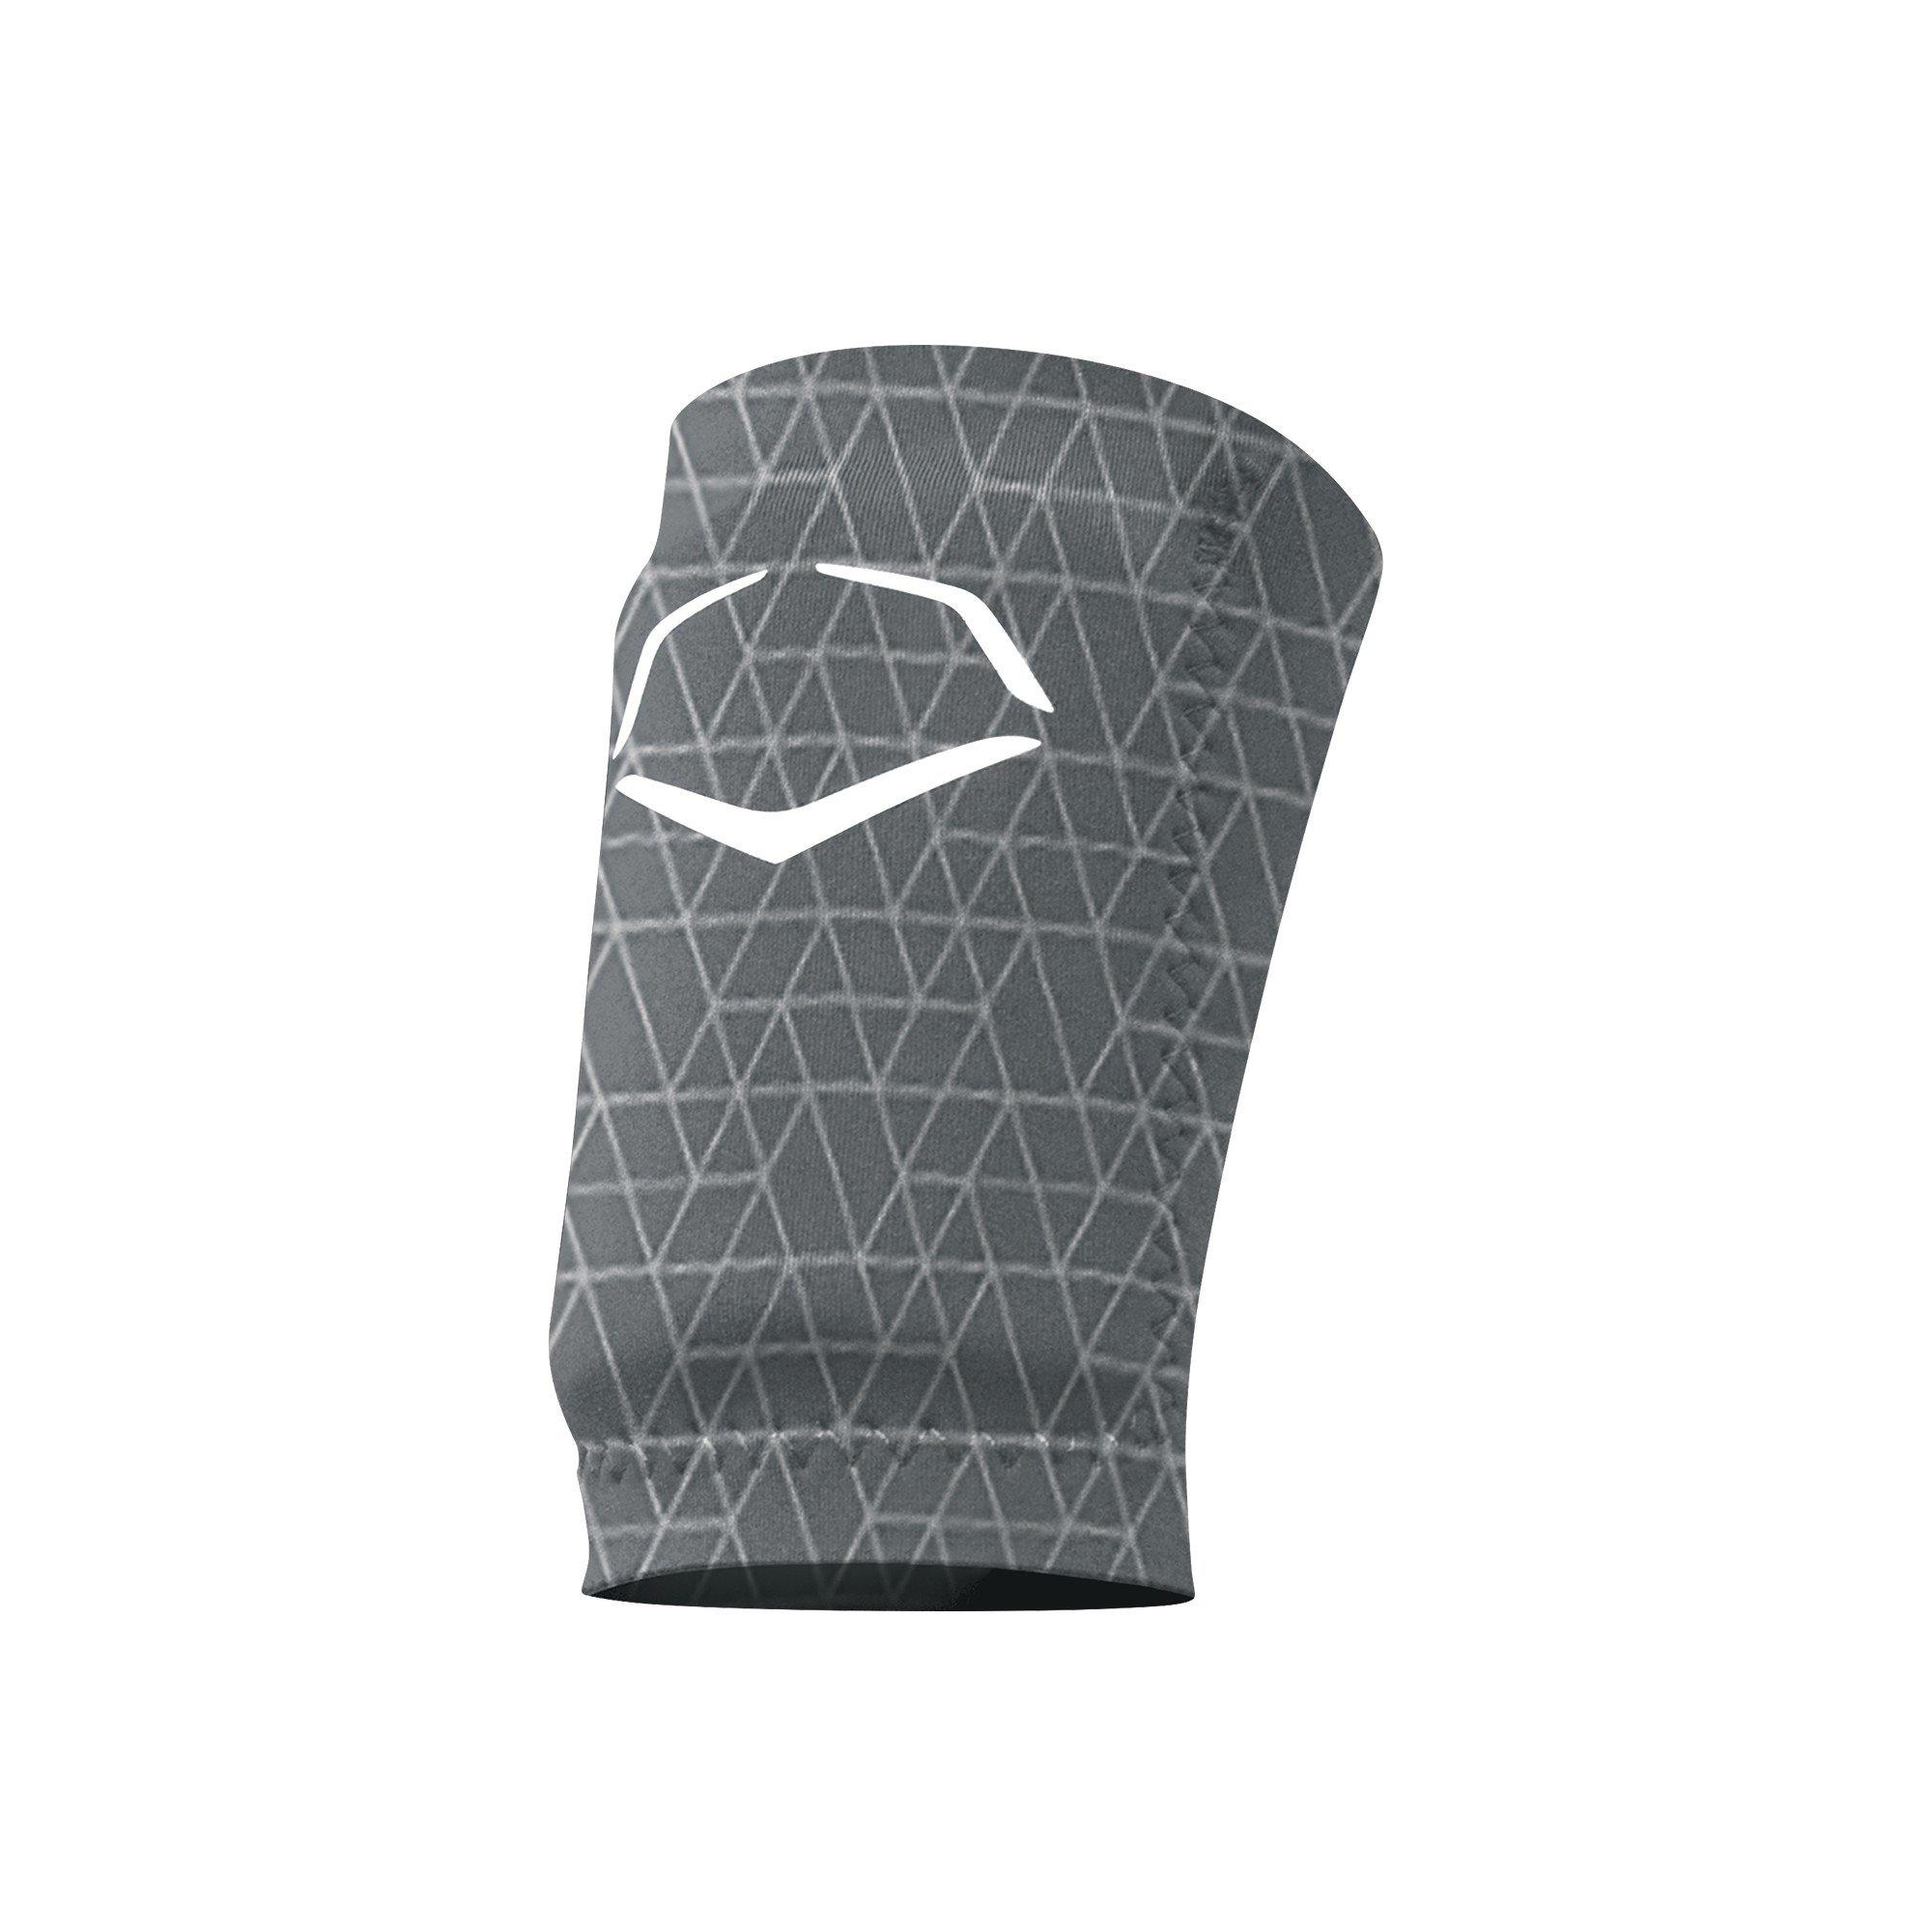 EvoShield EvoCharge Protective Wrist Guard - Extra Large, Grey